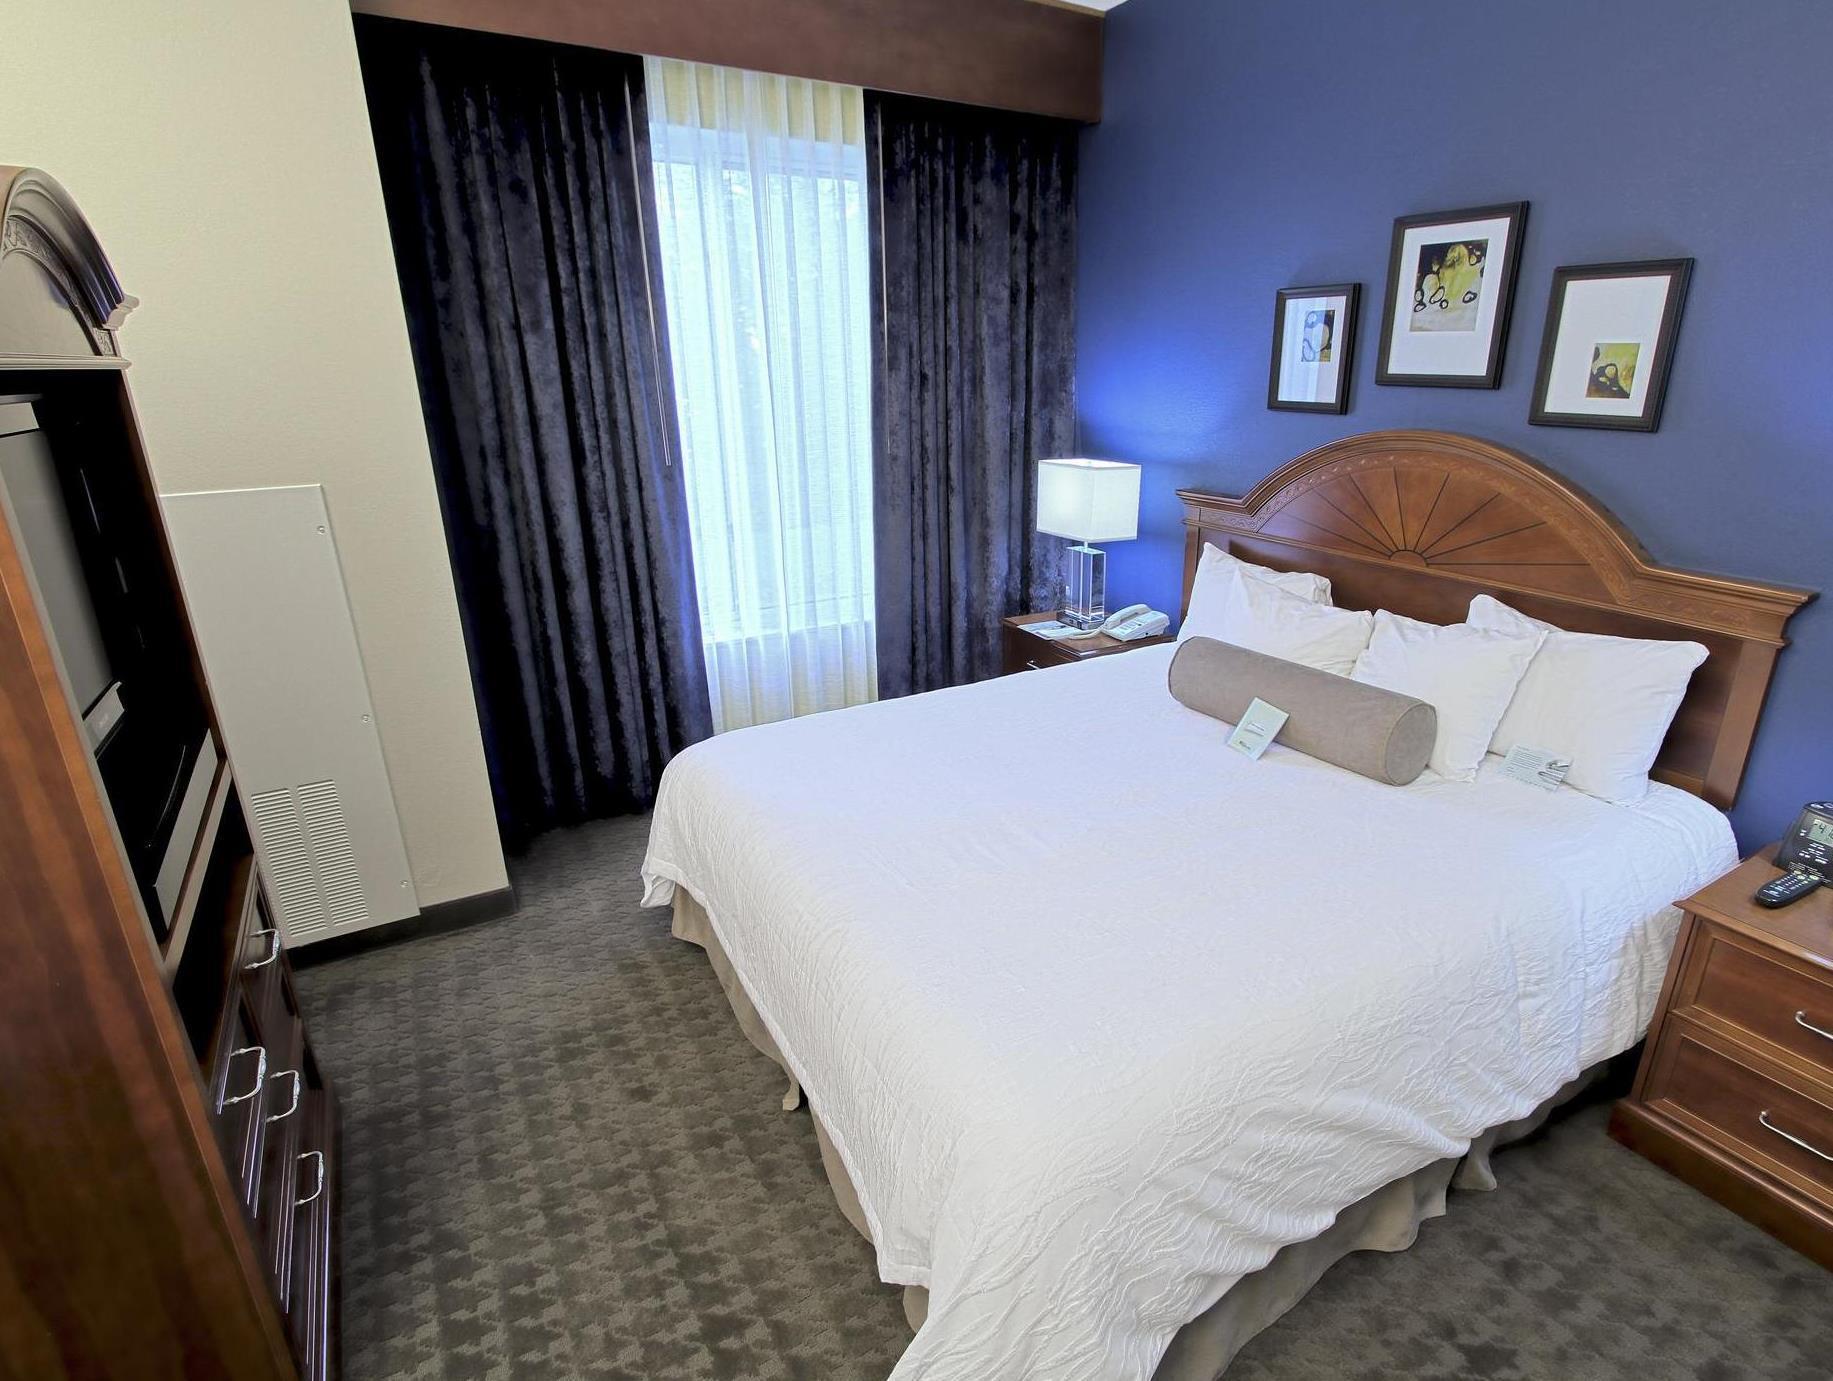 1 King Bed Deluxe   Bed Hilton Garden Inn Westbury Hotel